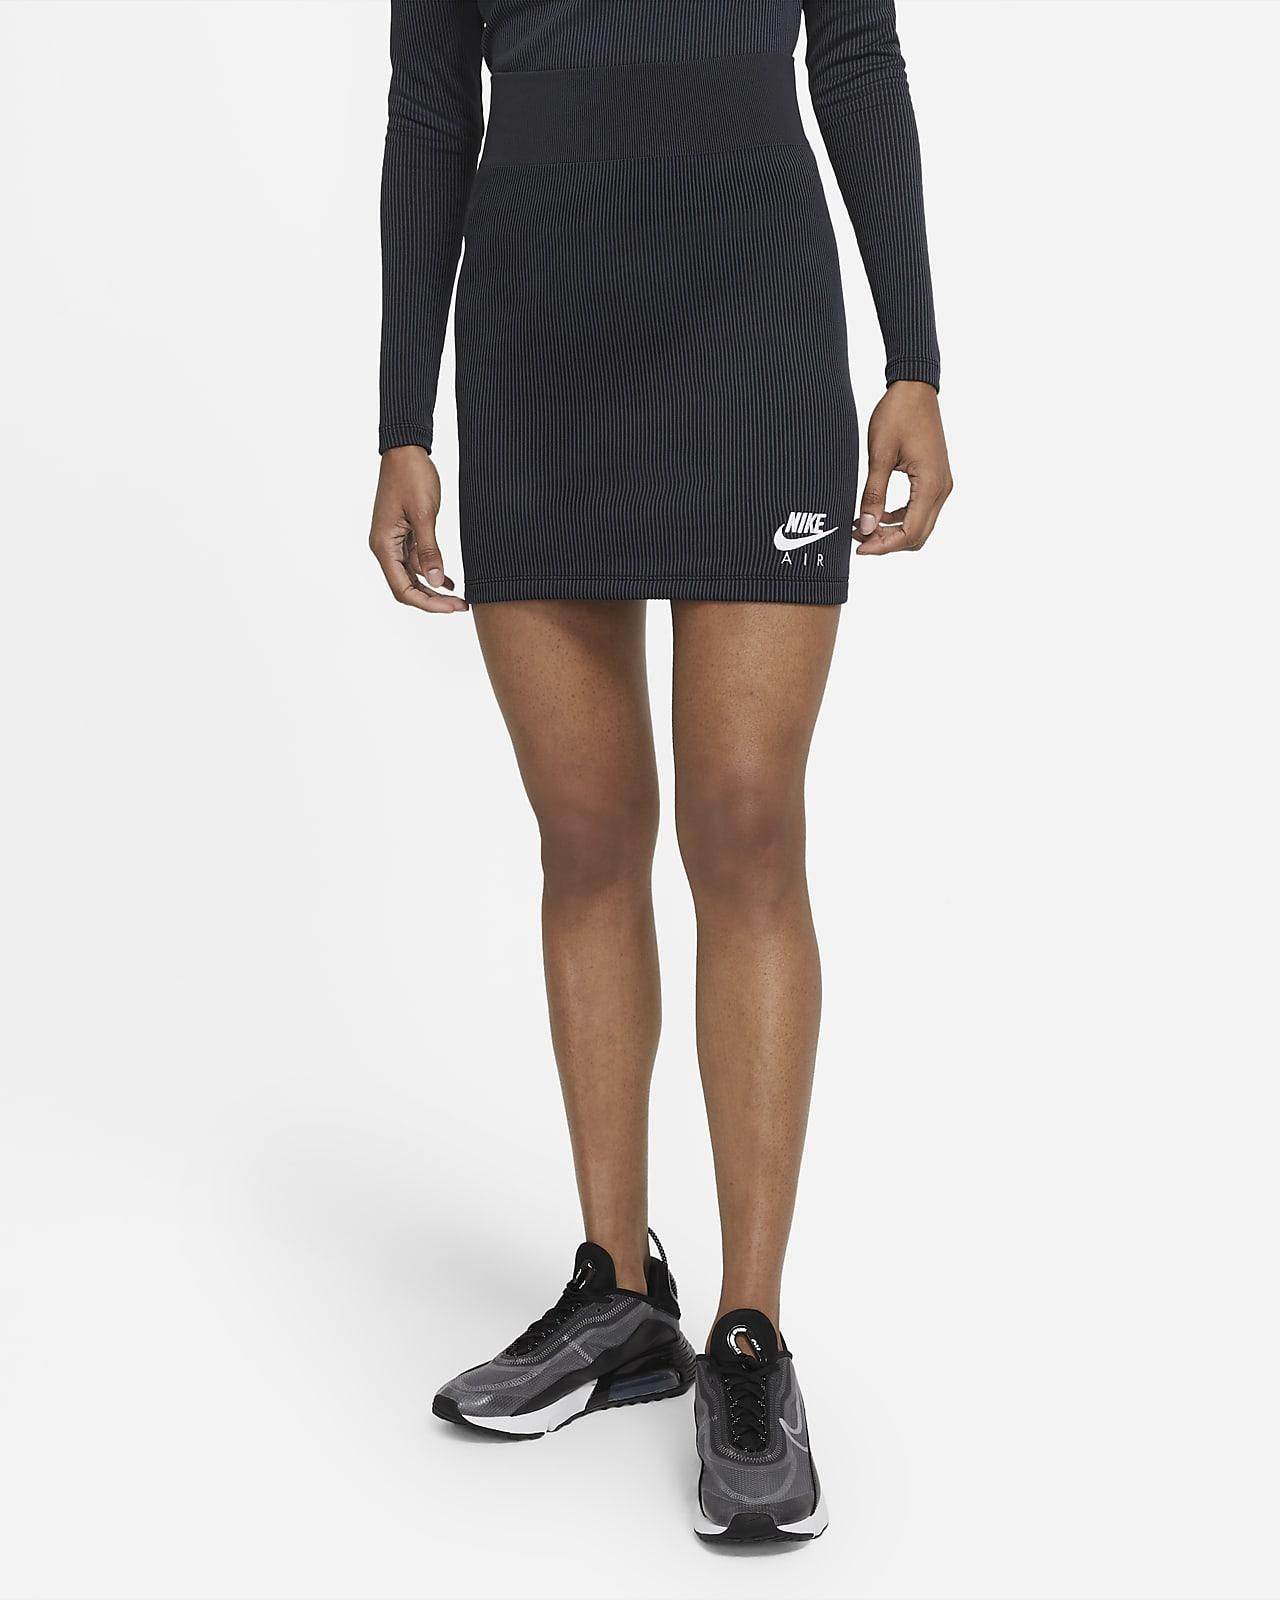 Falda para mujer Nike Air